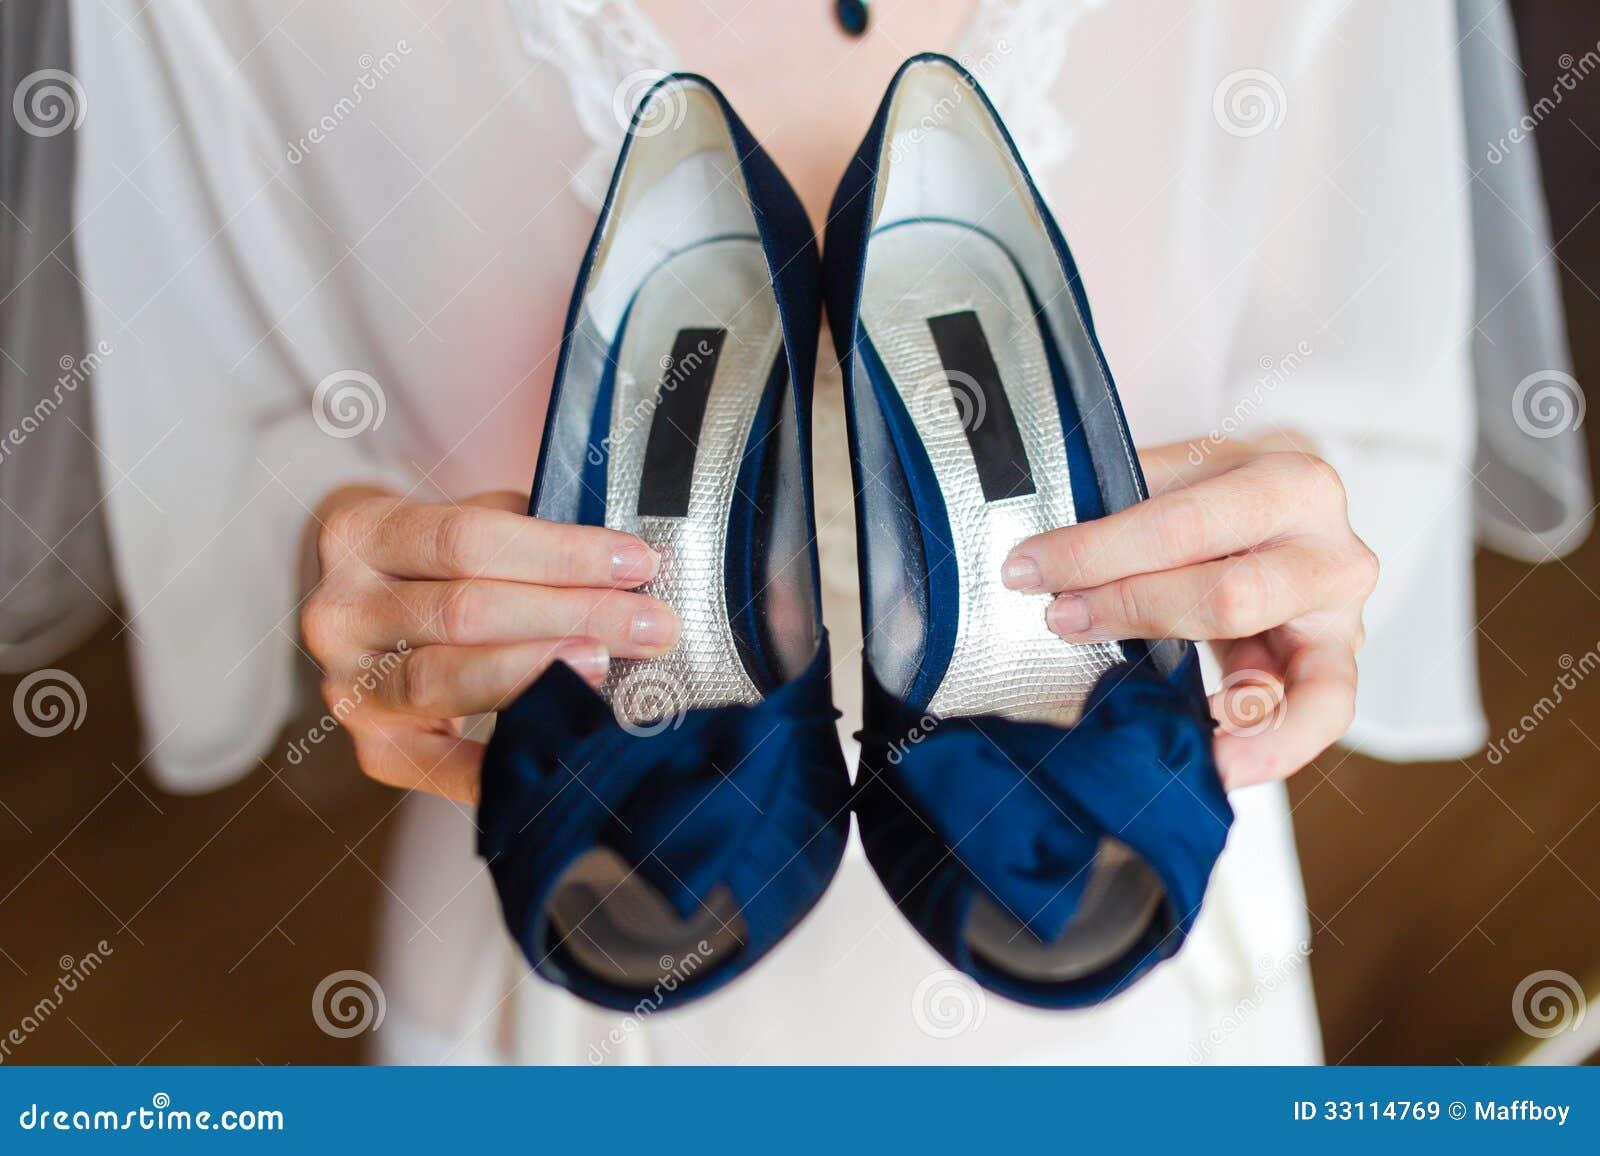 Blaue Brautschuhe Lizenzfreie Stockbilder - Bild: 33114769